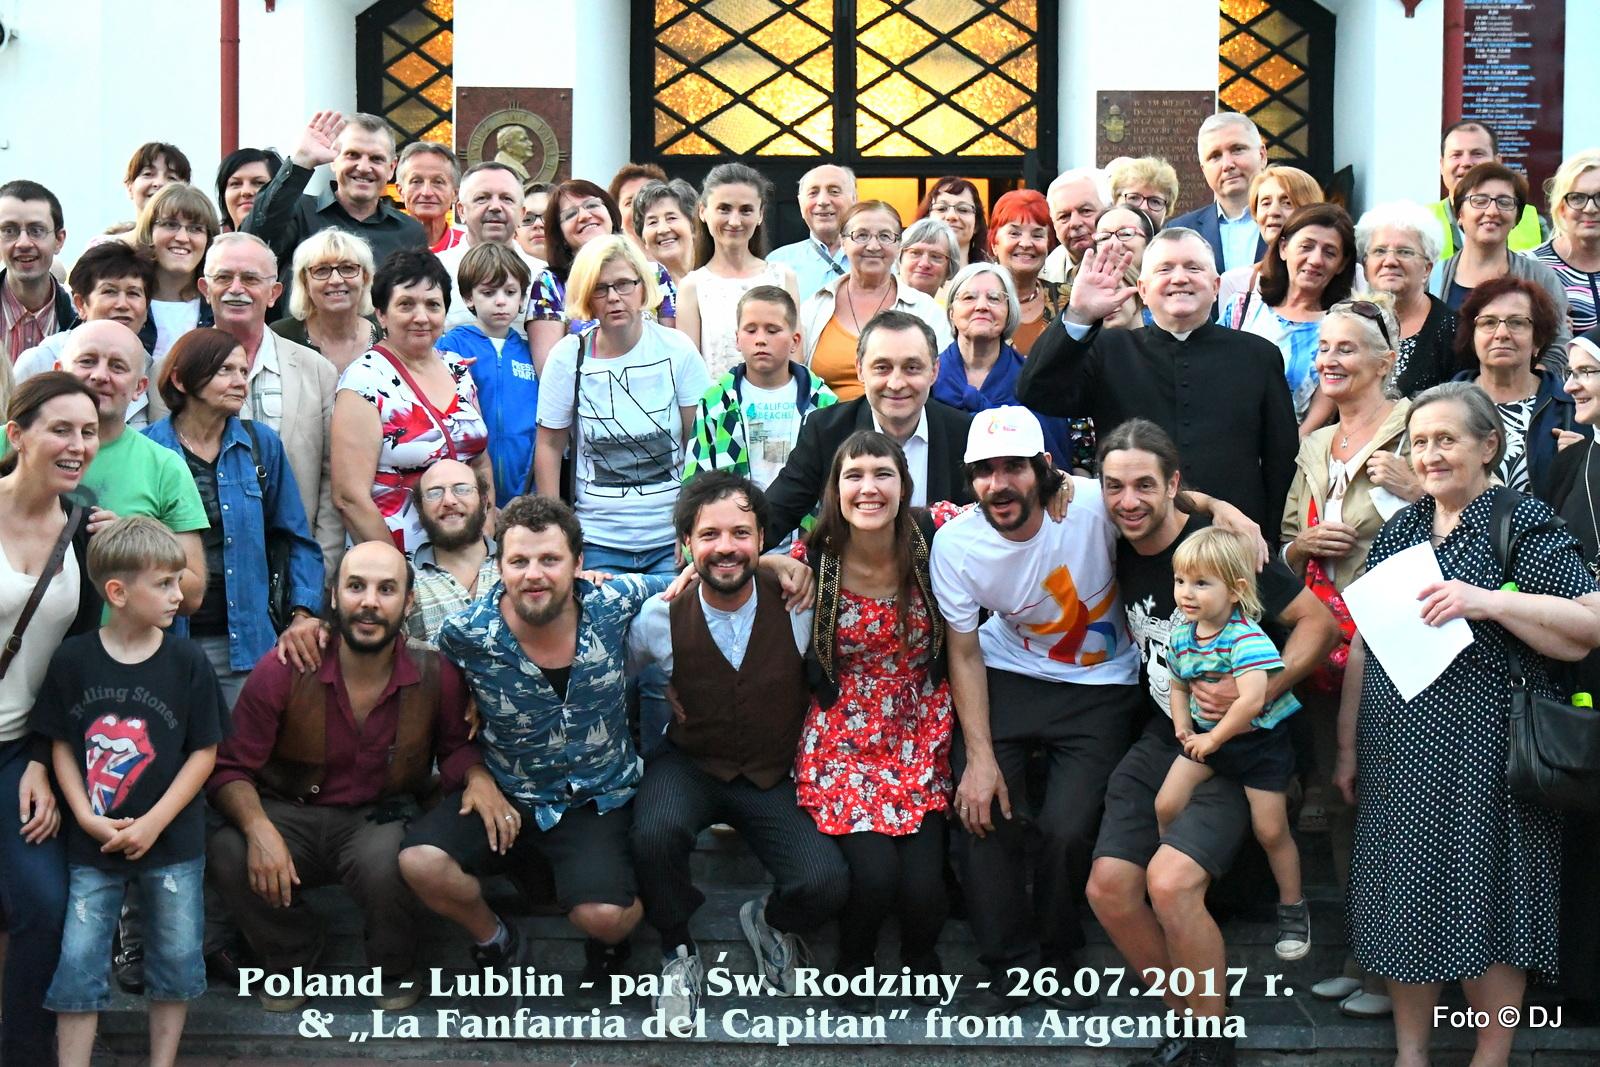 Poland - Lublin - par. Sw. Rodziny - 26.07.2017 r. and La Fanfarria del Capitan